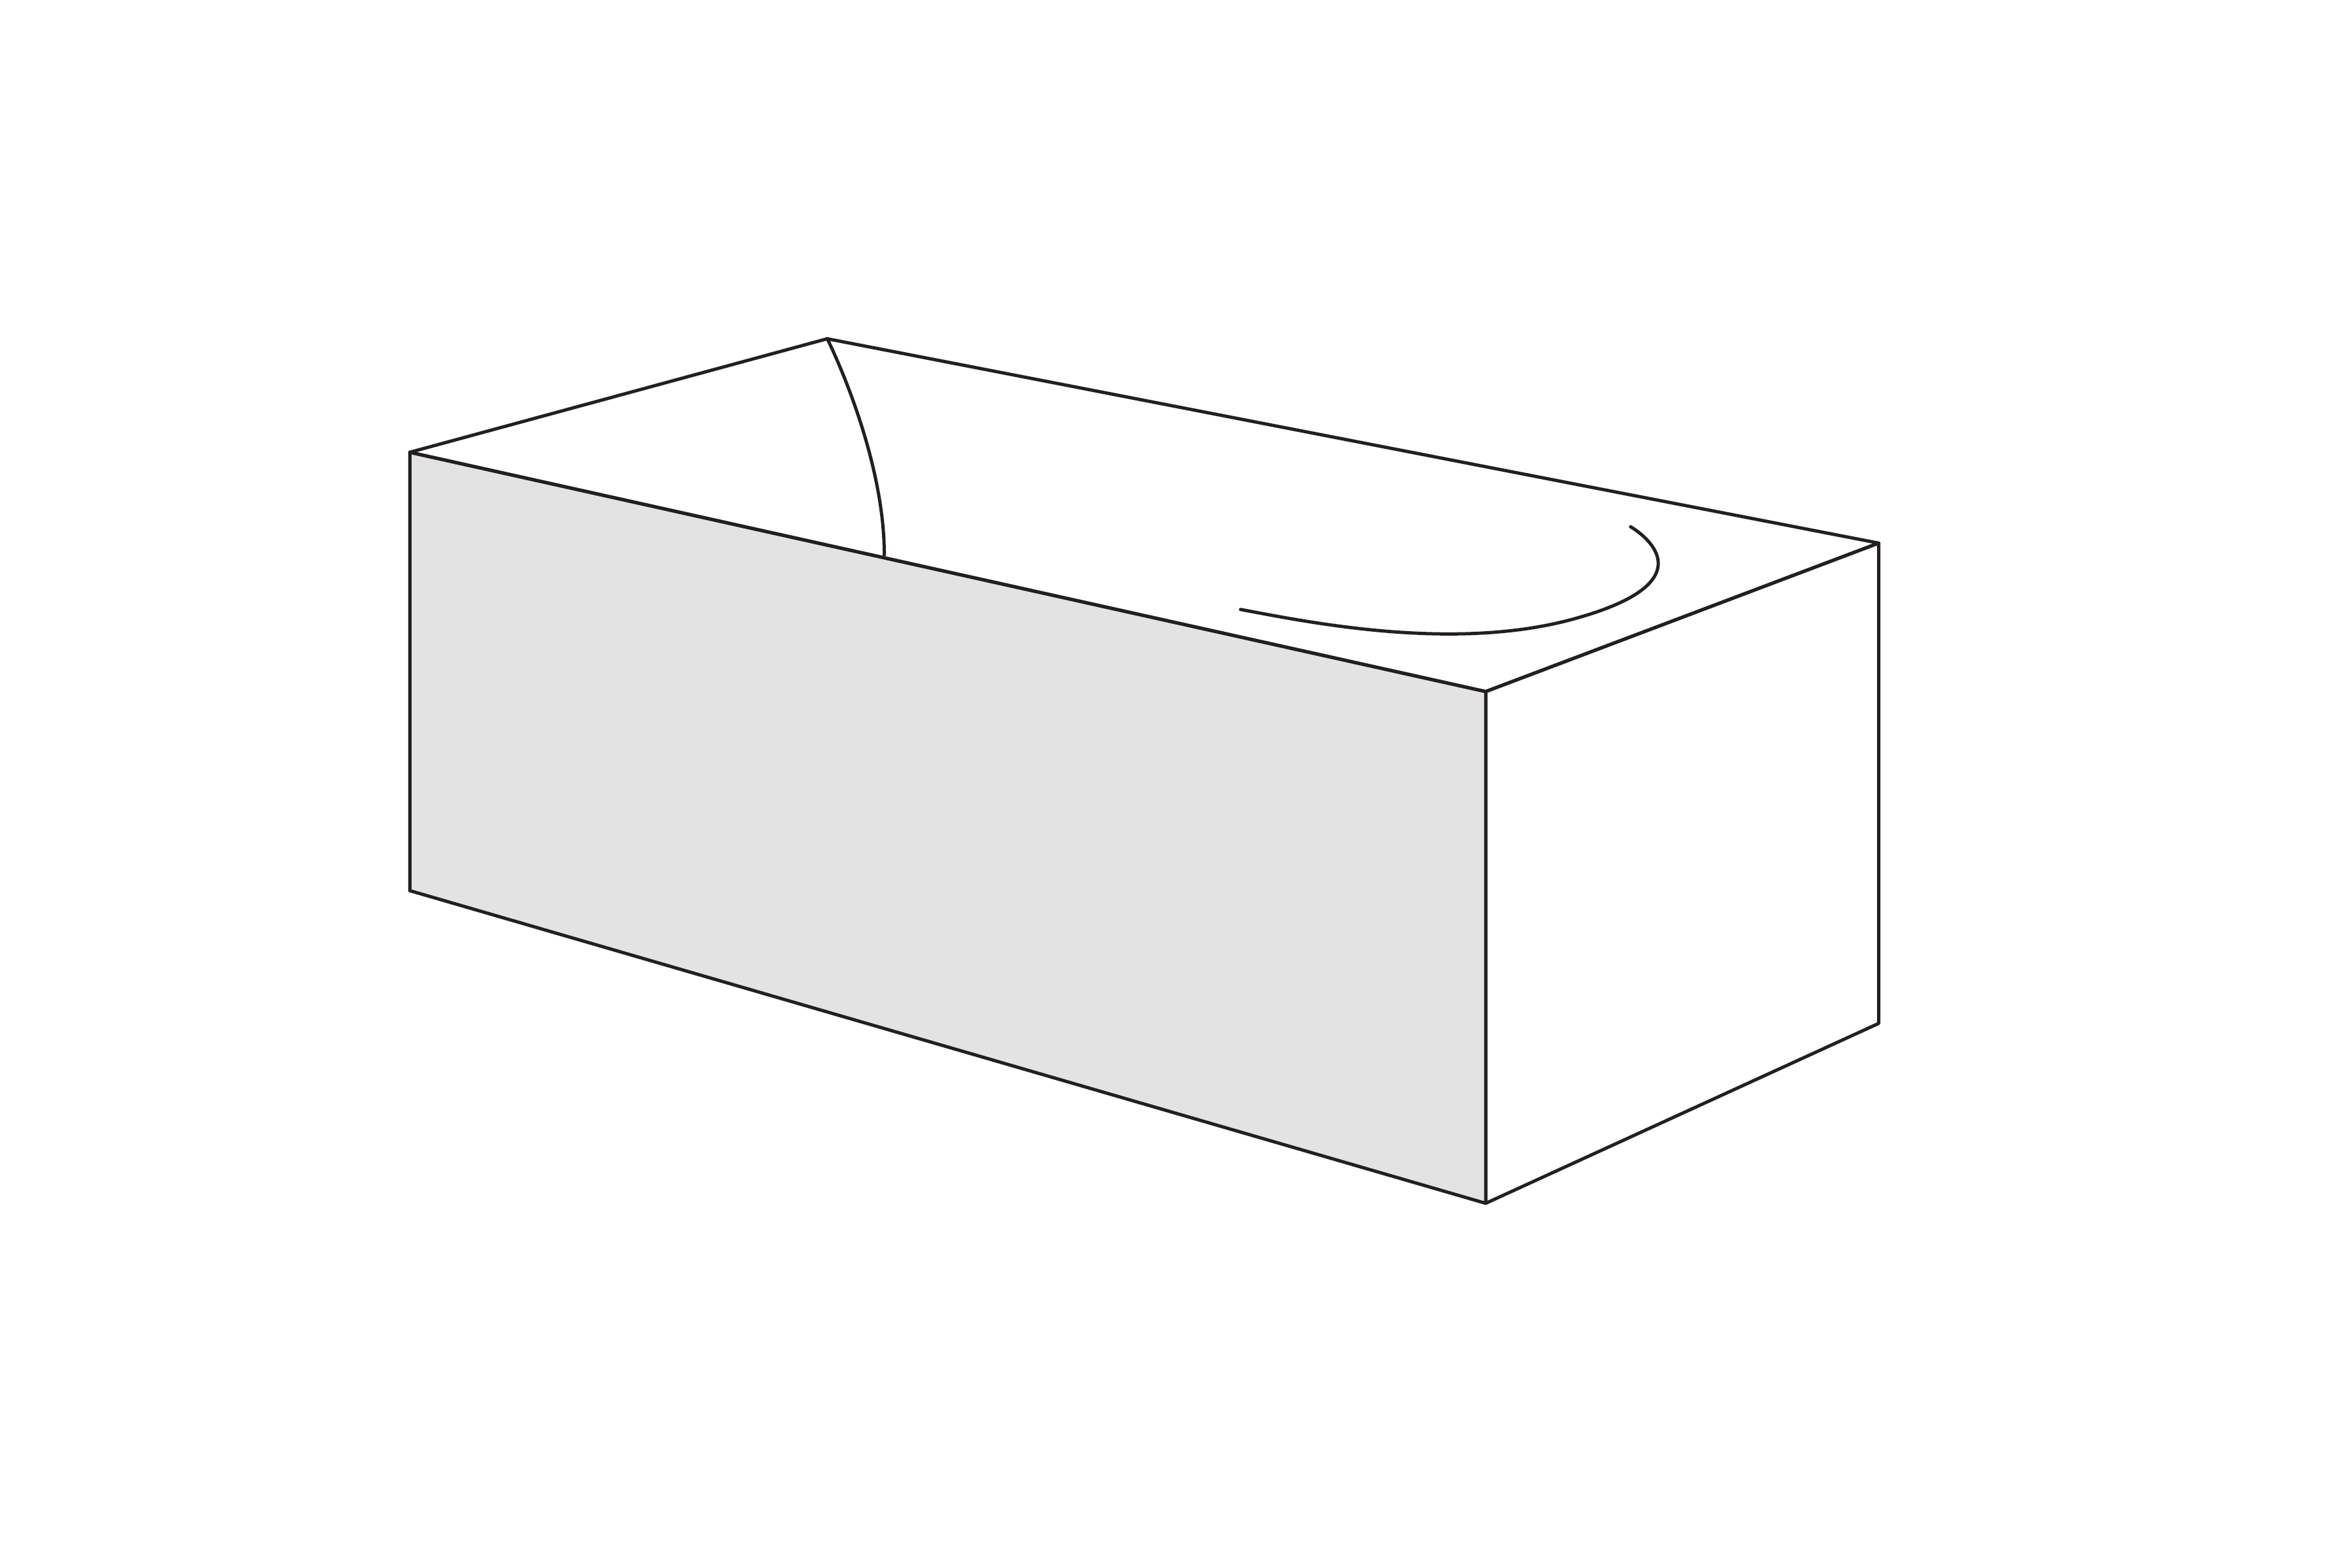 Panou frontal Radaway pentru cazi rectangulare 170cm h58cm imagine